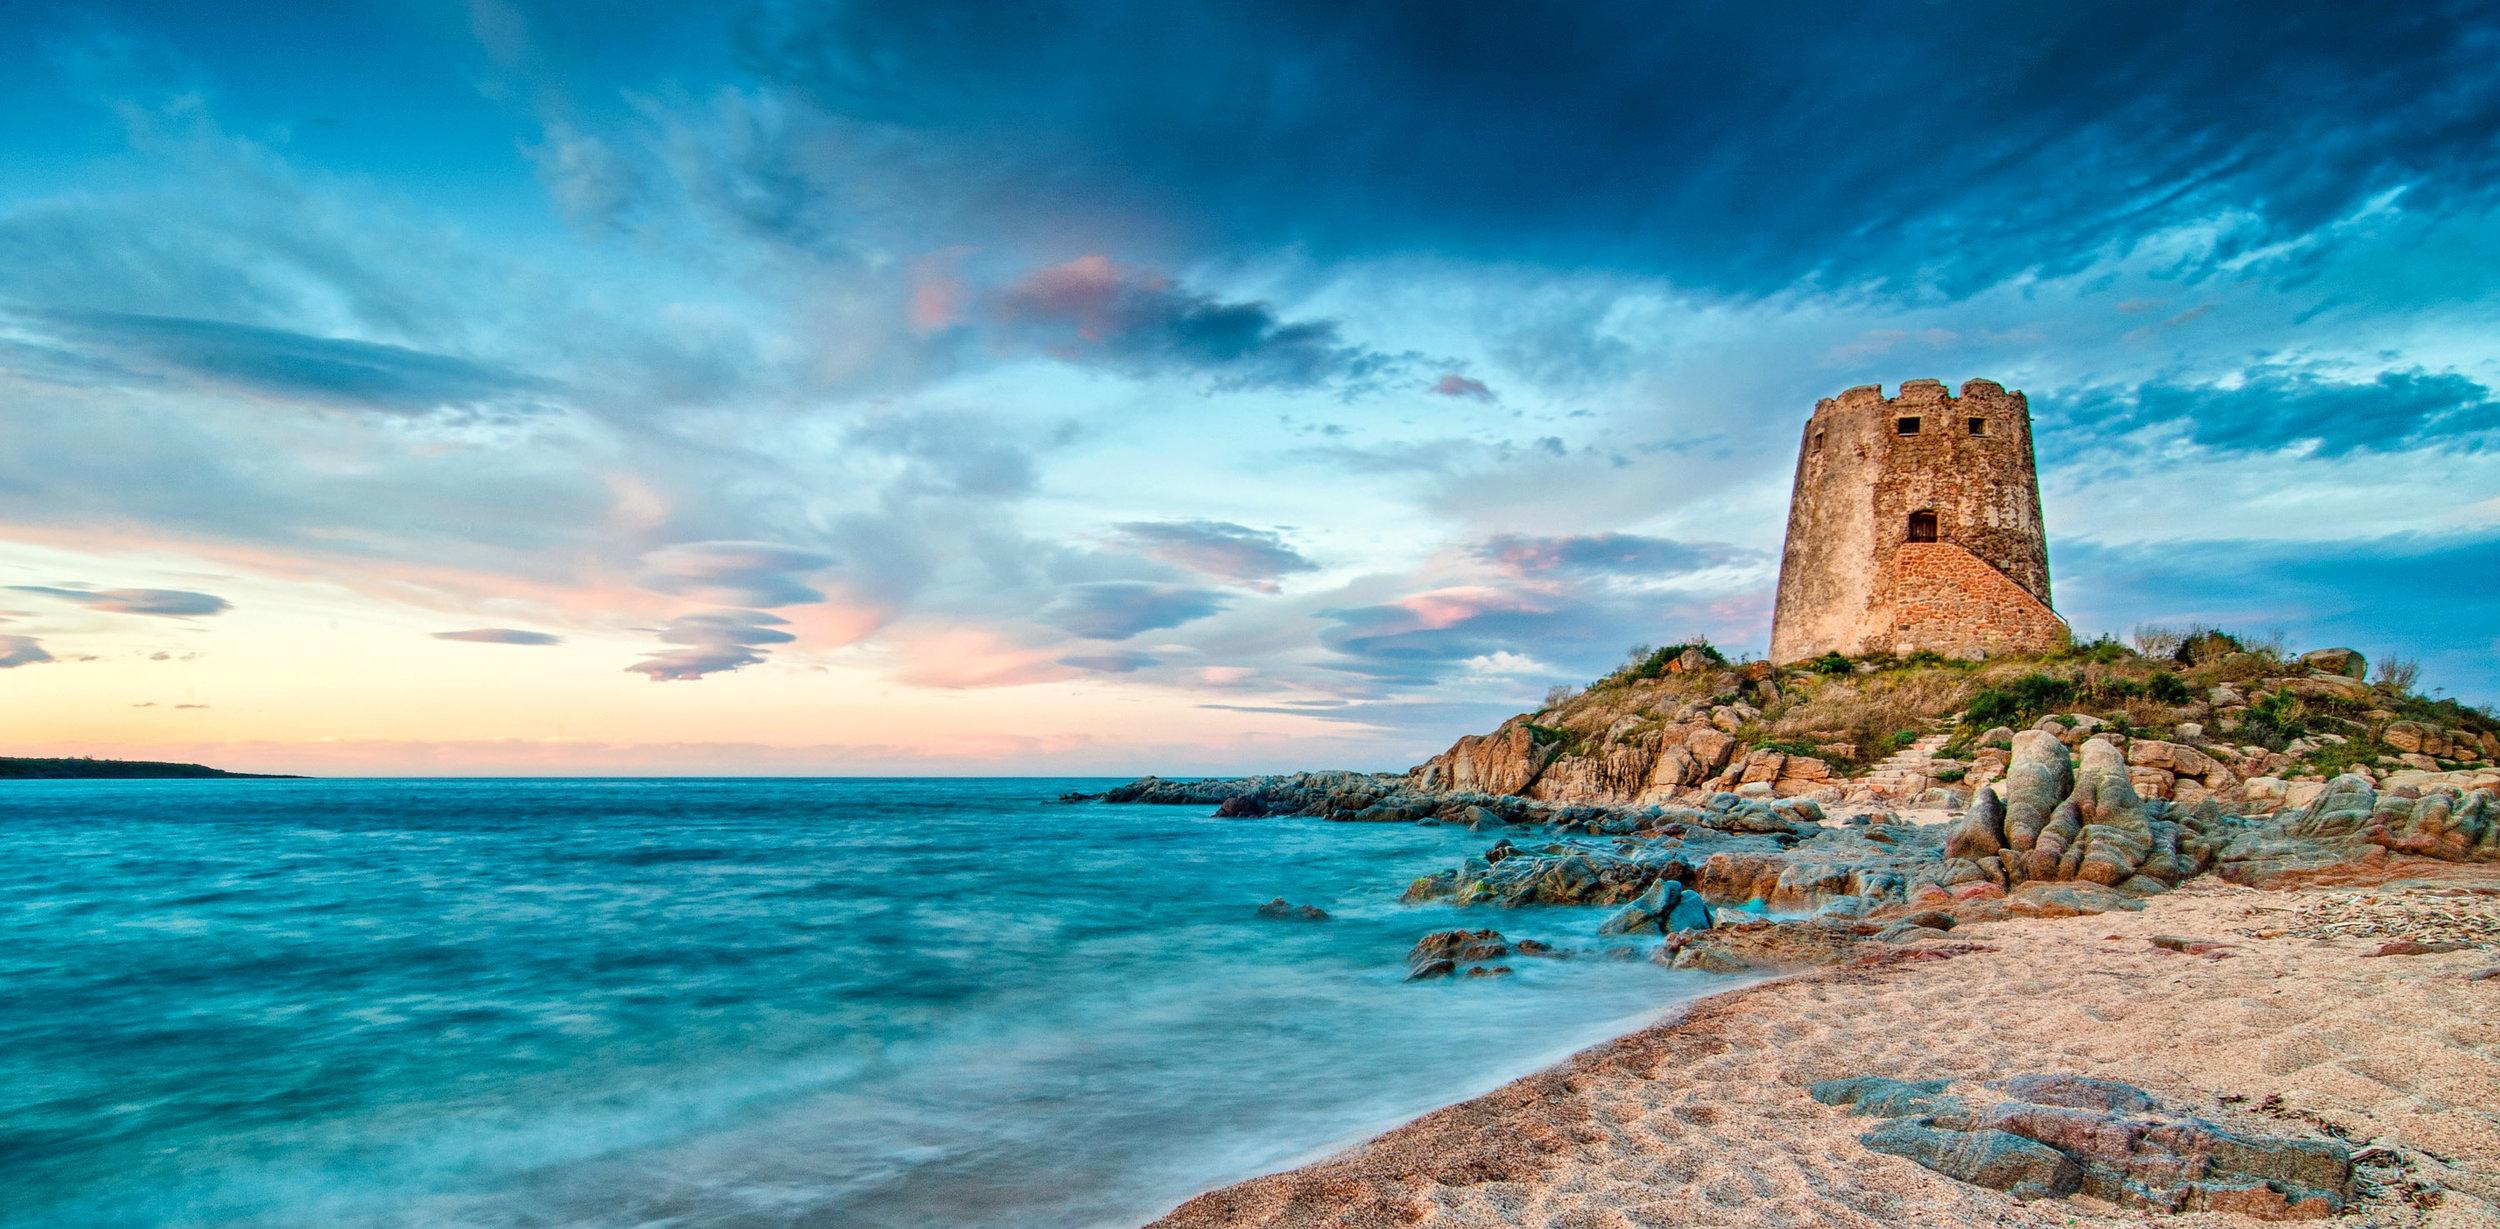 La Torre di Bari Barisardo Sardinia Italy Sunset Long Exposure_Raffaele Cabras (1) copy.jpg